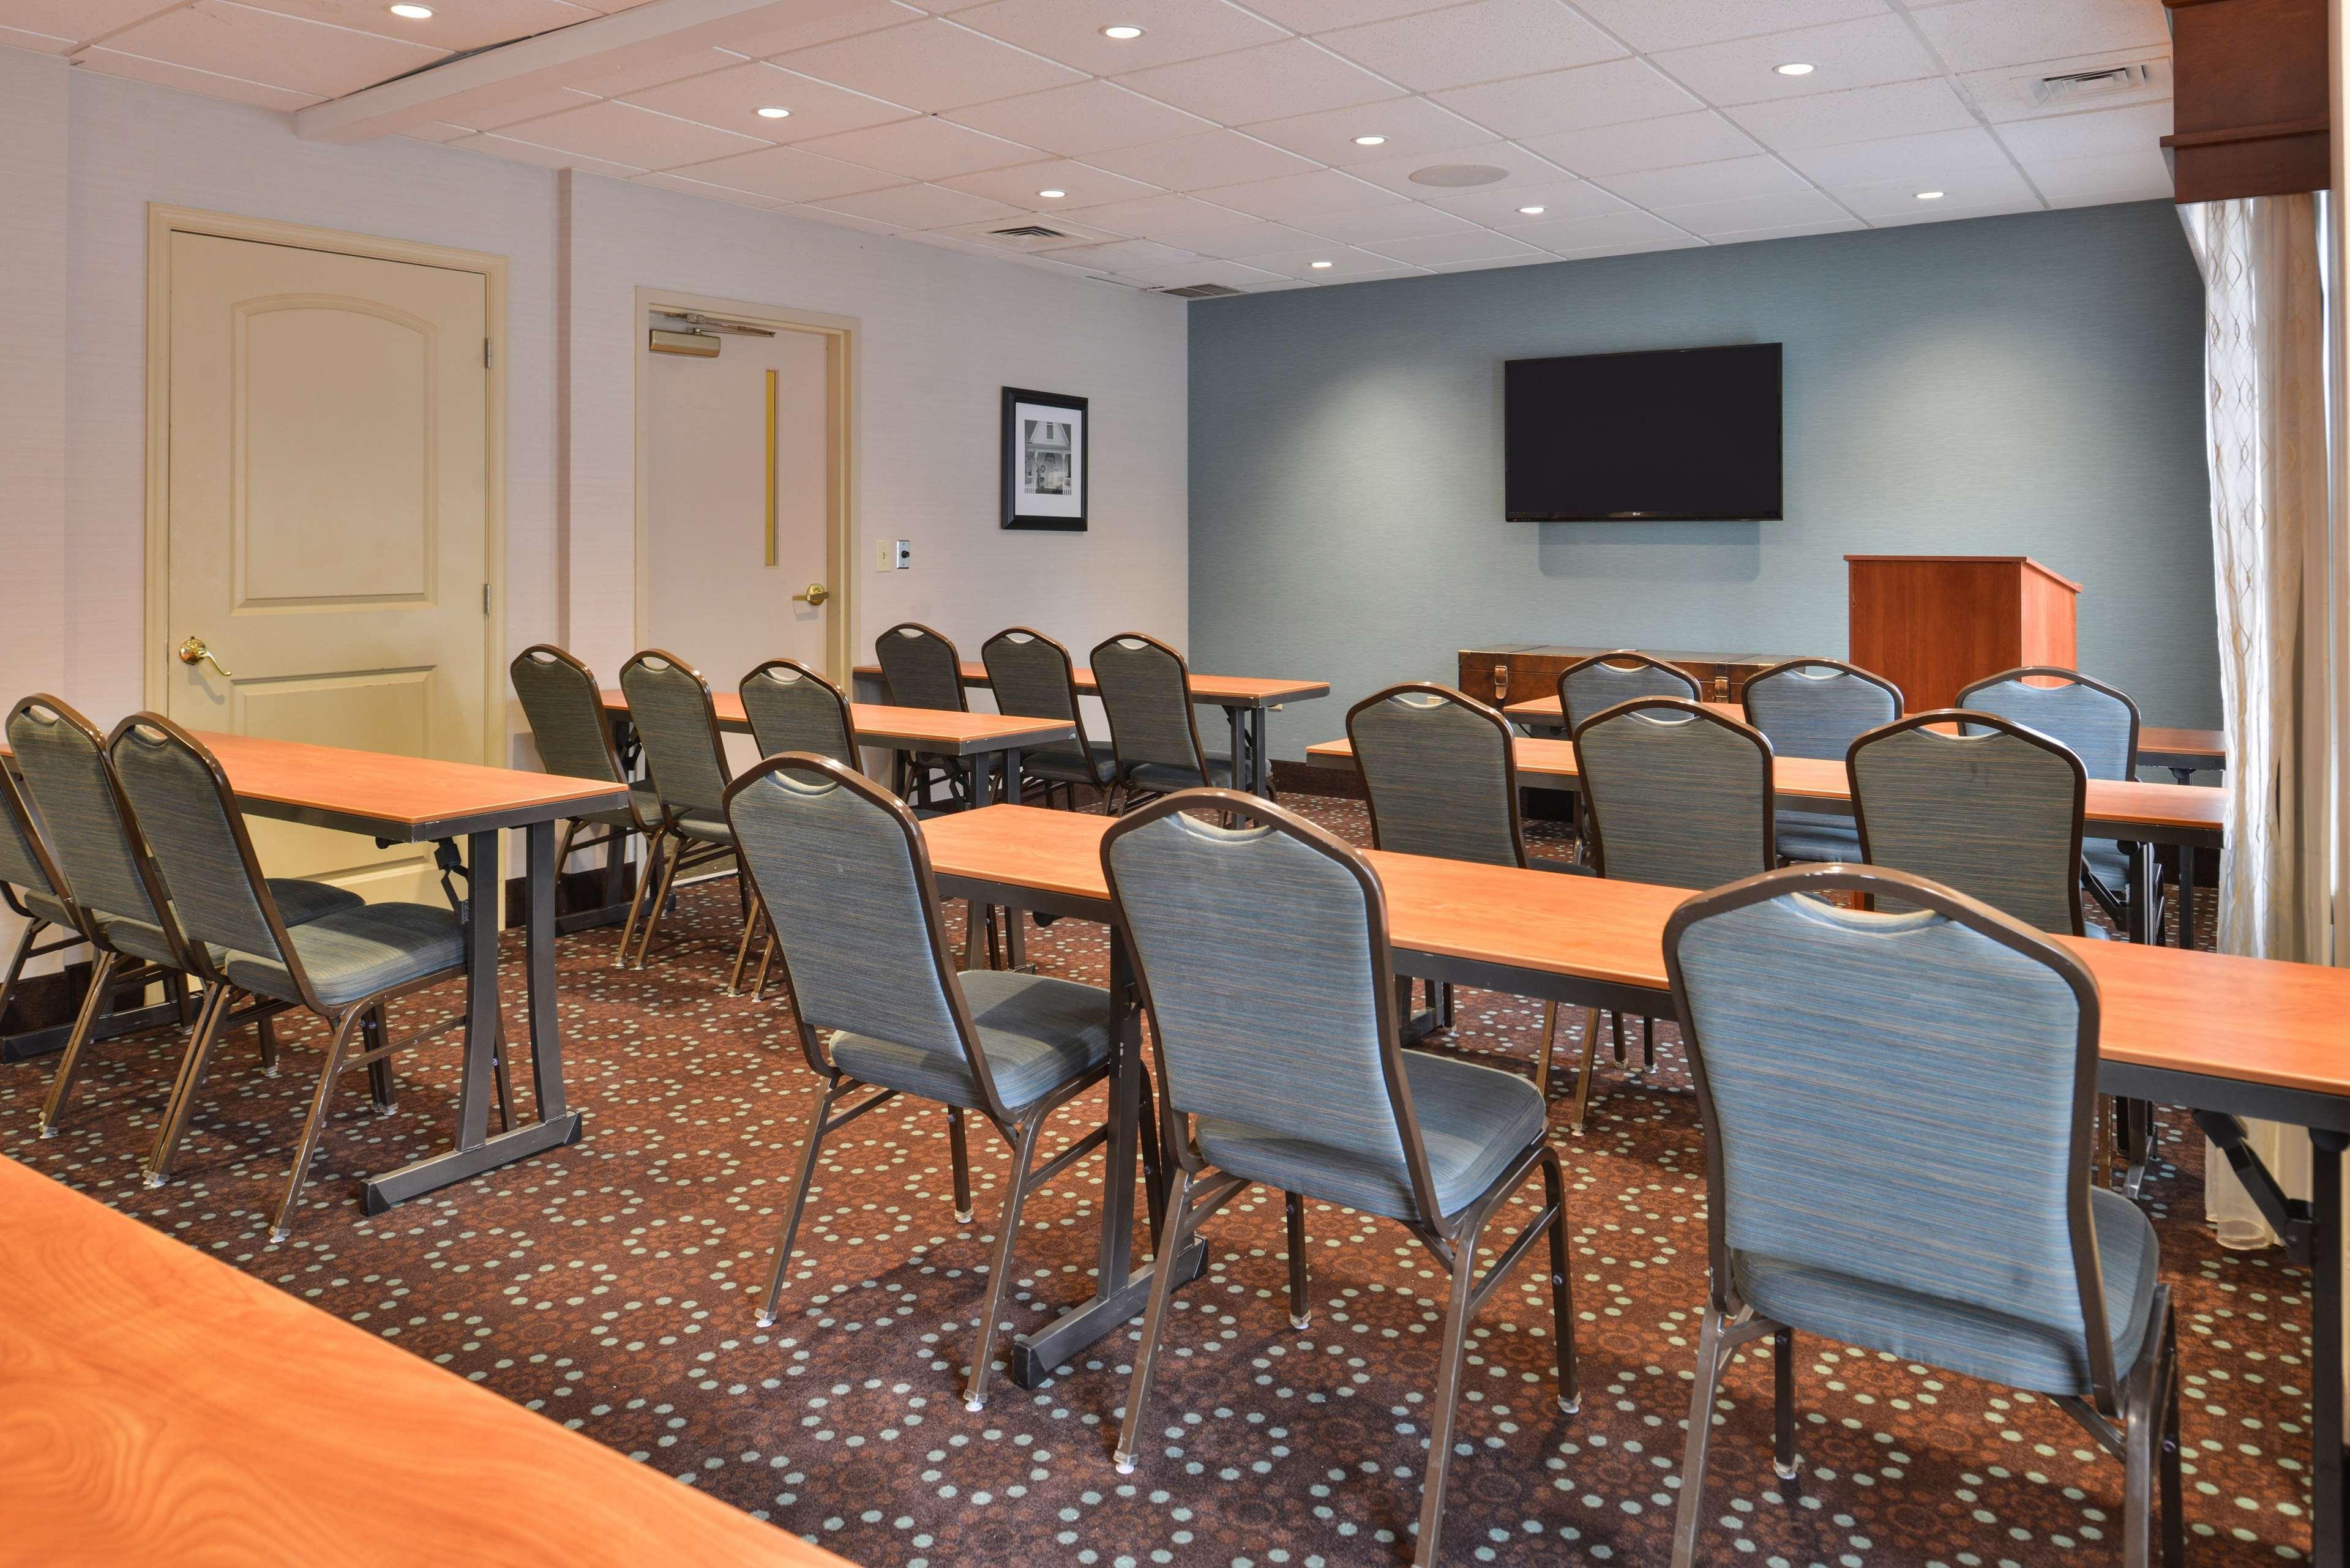 Hampton Inn & Suites Newport News (Oyster Point) image 48